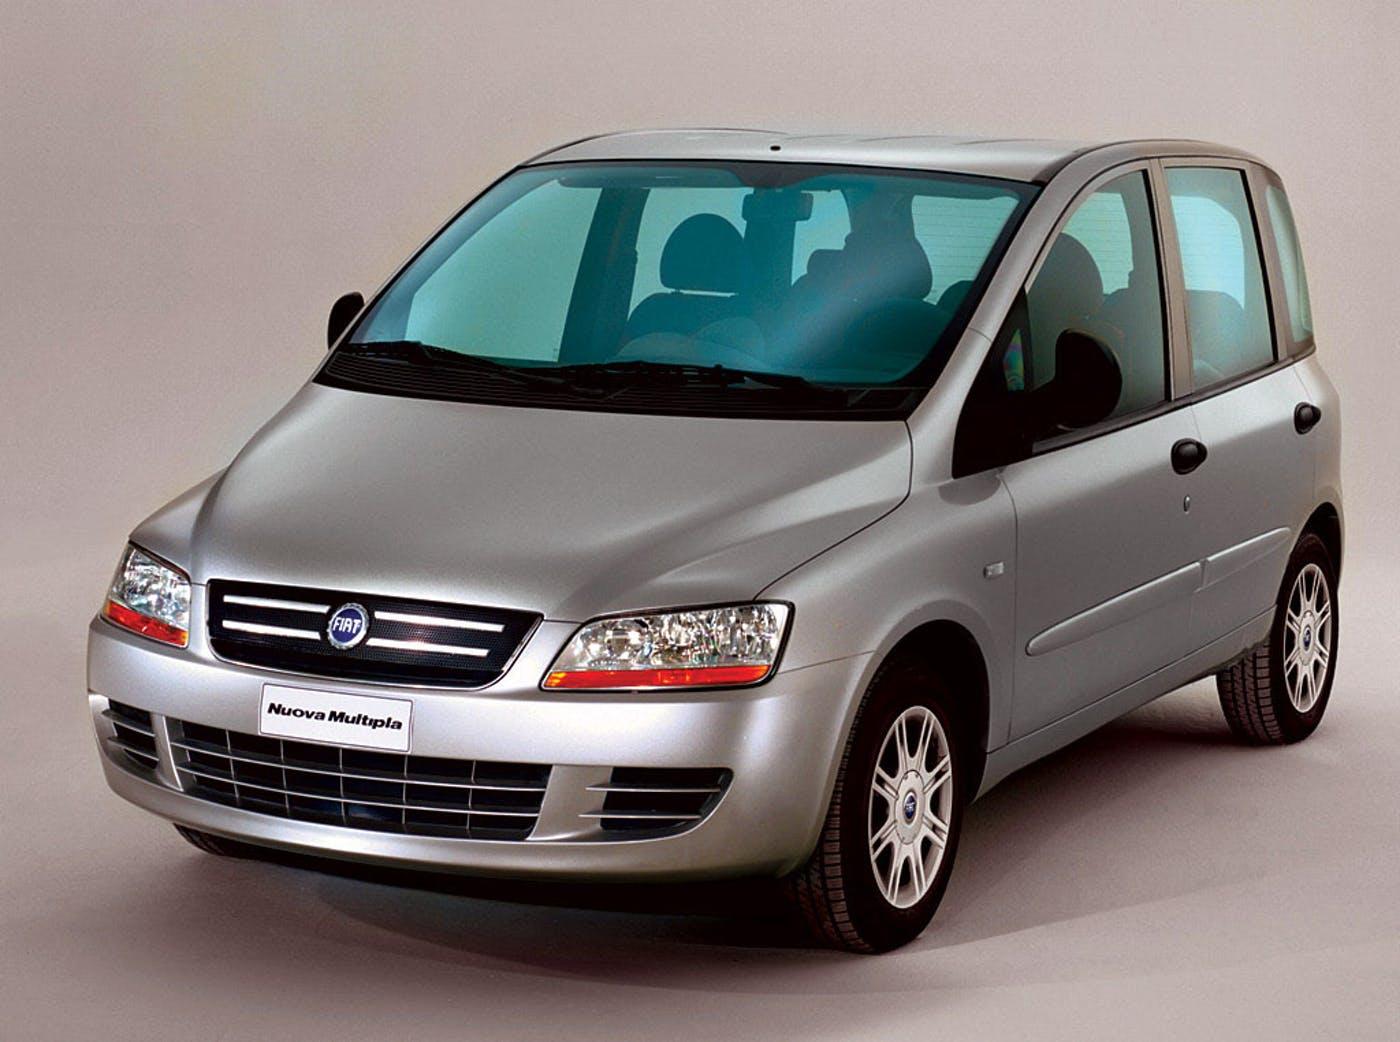 Fiat Multipla I 1998 - 2004 Compact MPV #5